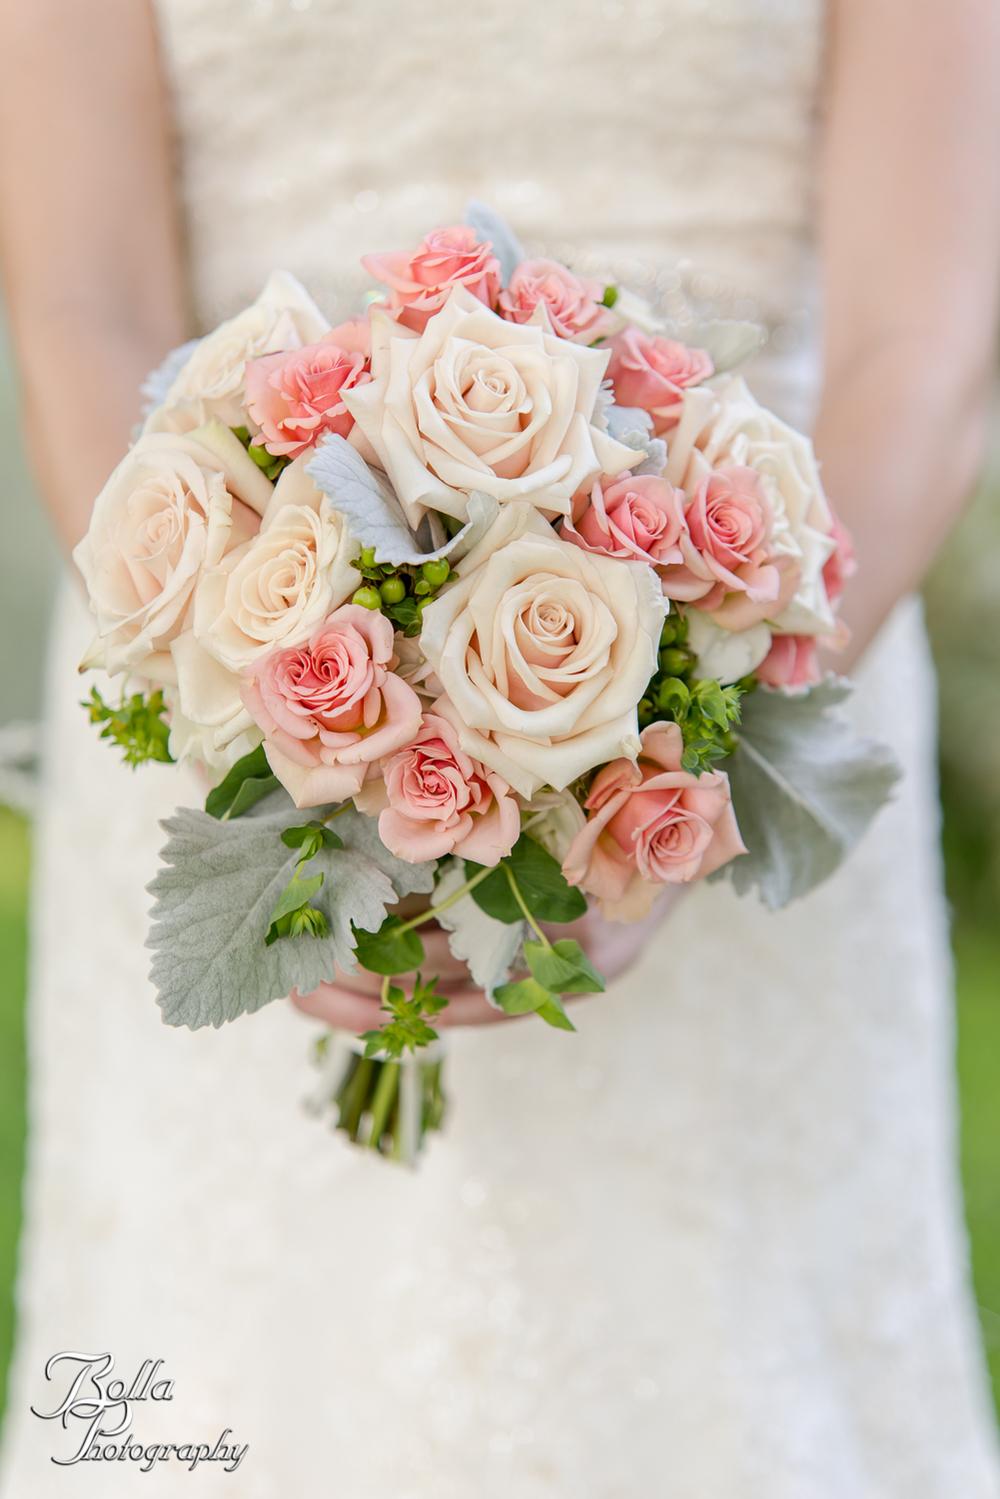 Bolla_Photography_St_Louis_wedding_photographer-0123.jpg